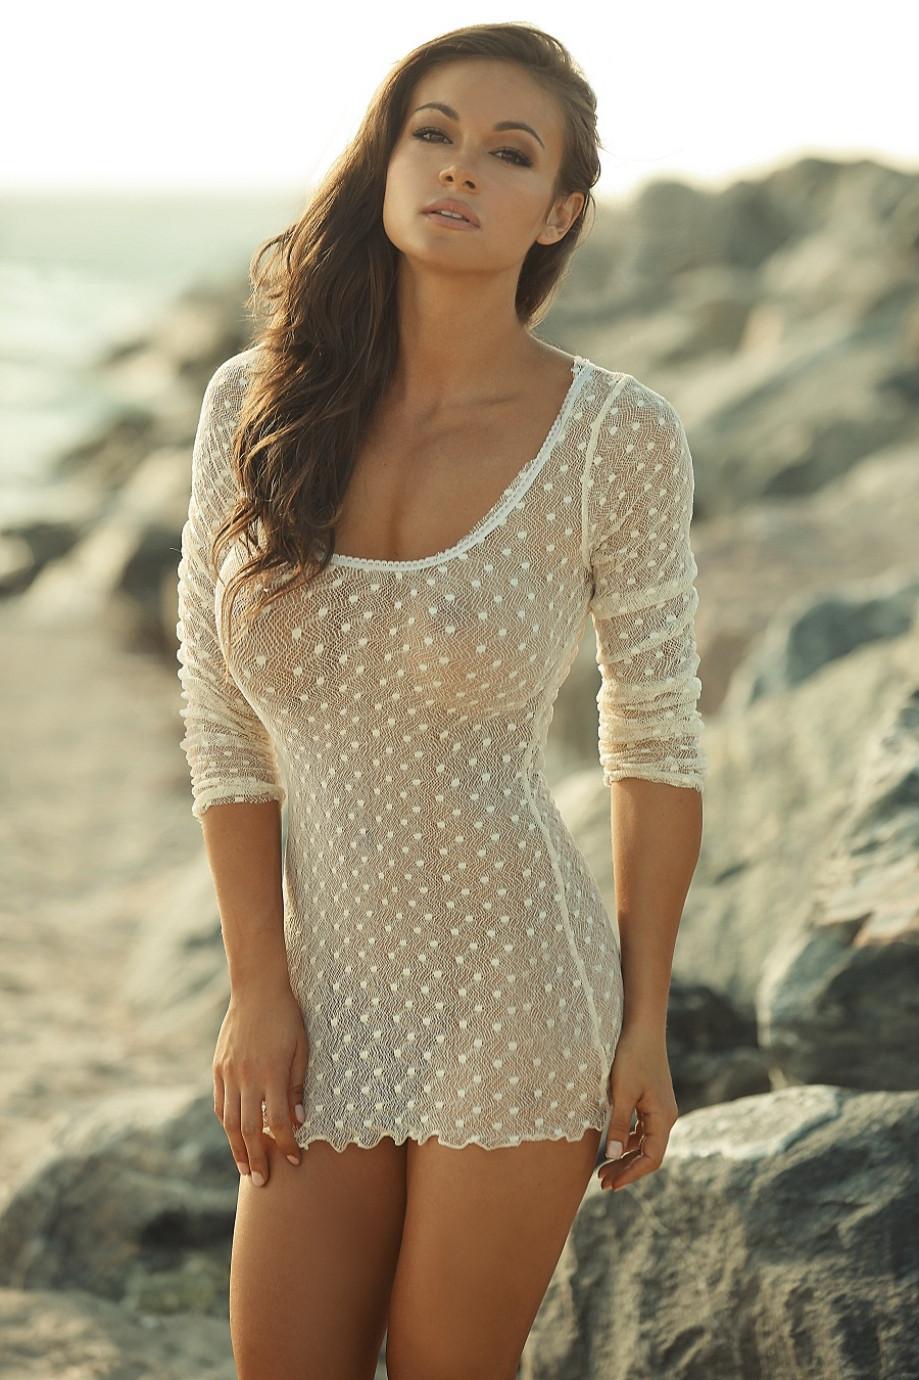 myanmar sexiest naked models hot